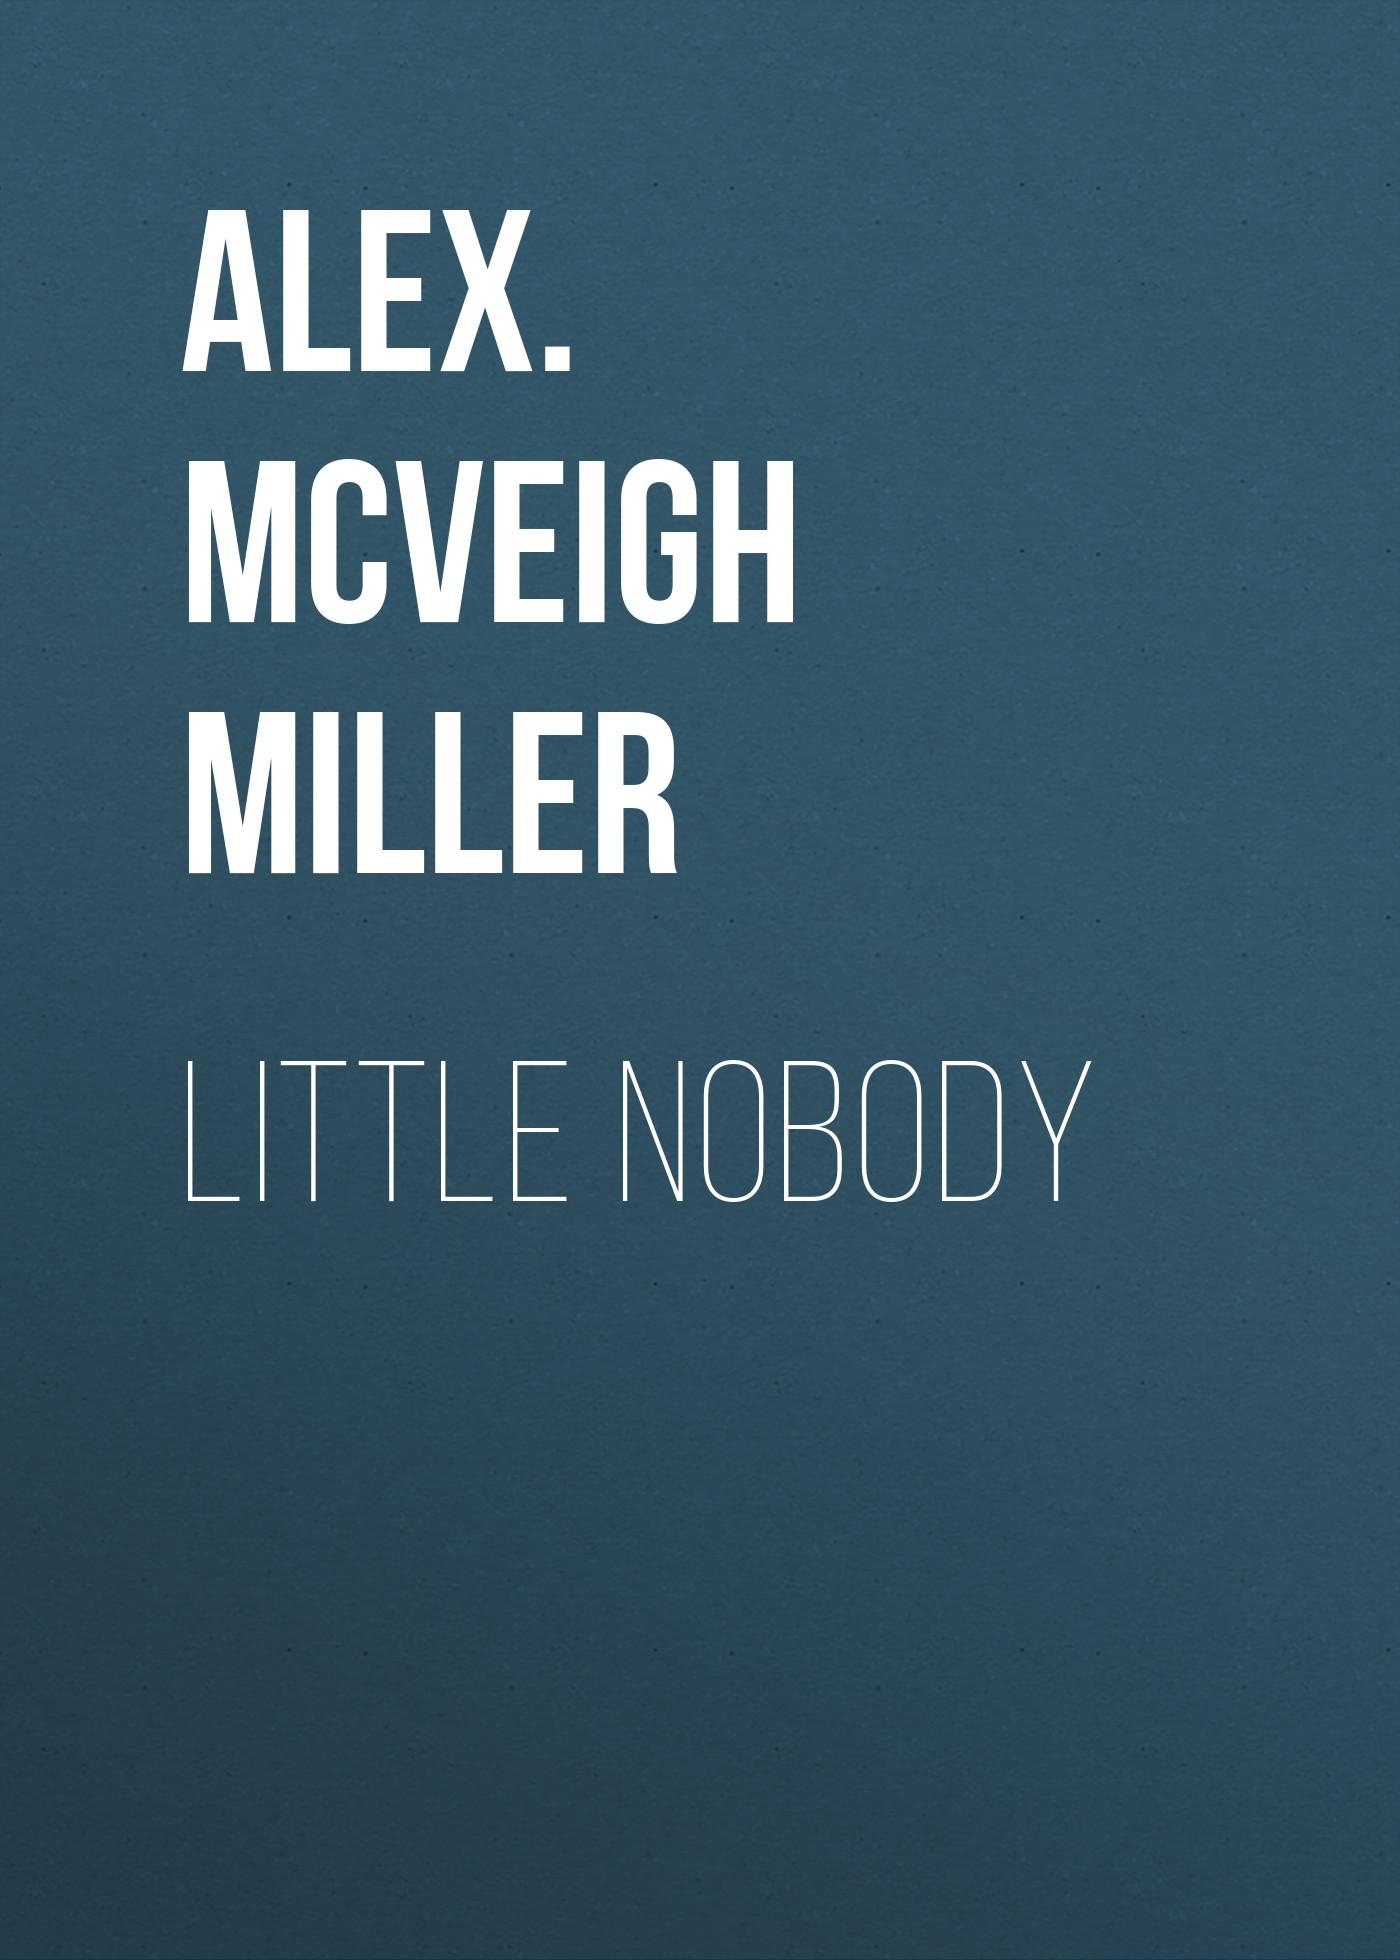 Alex. McVeigh Miller Little Nobody nobody s perfect